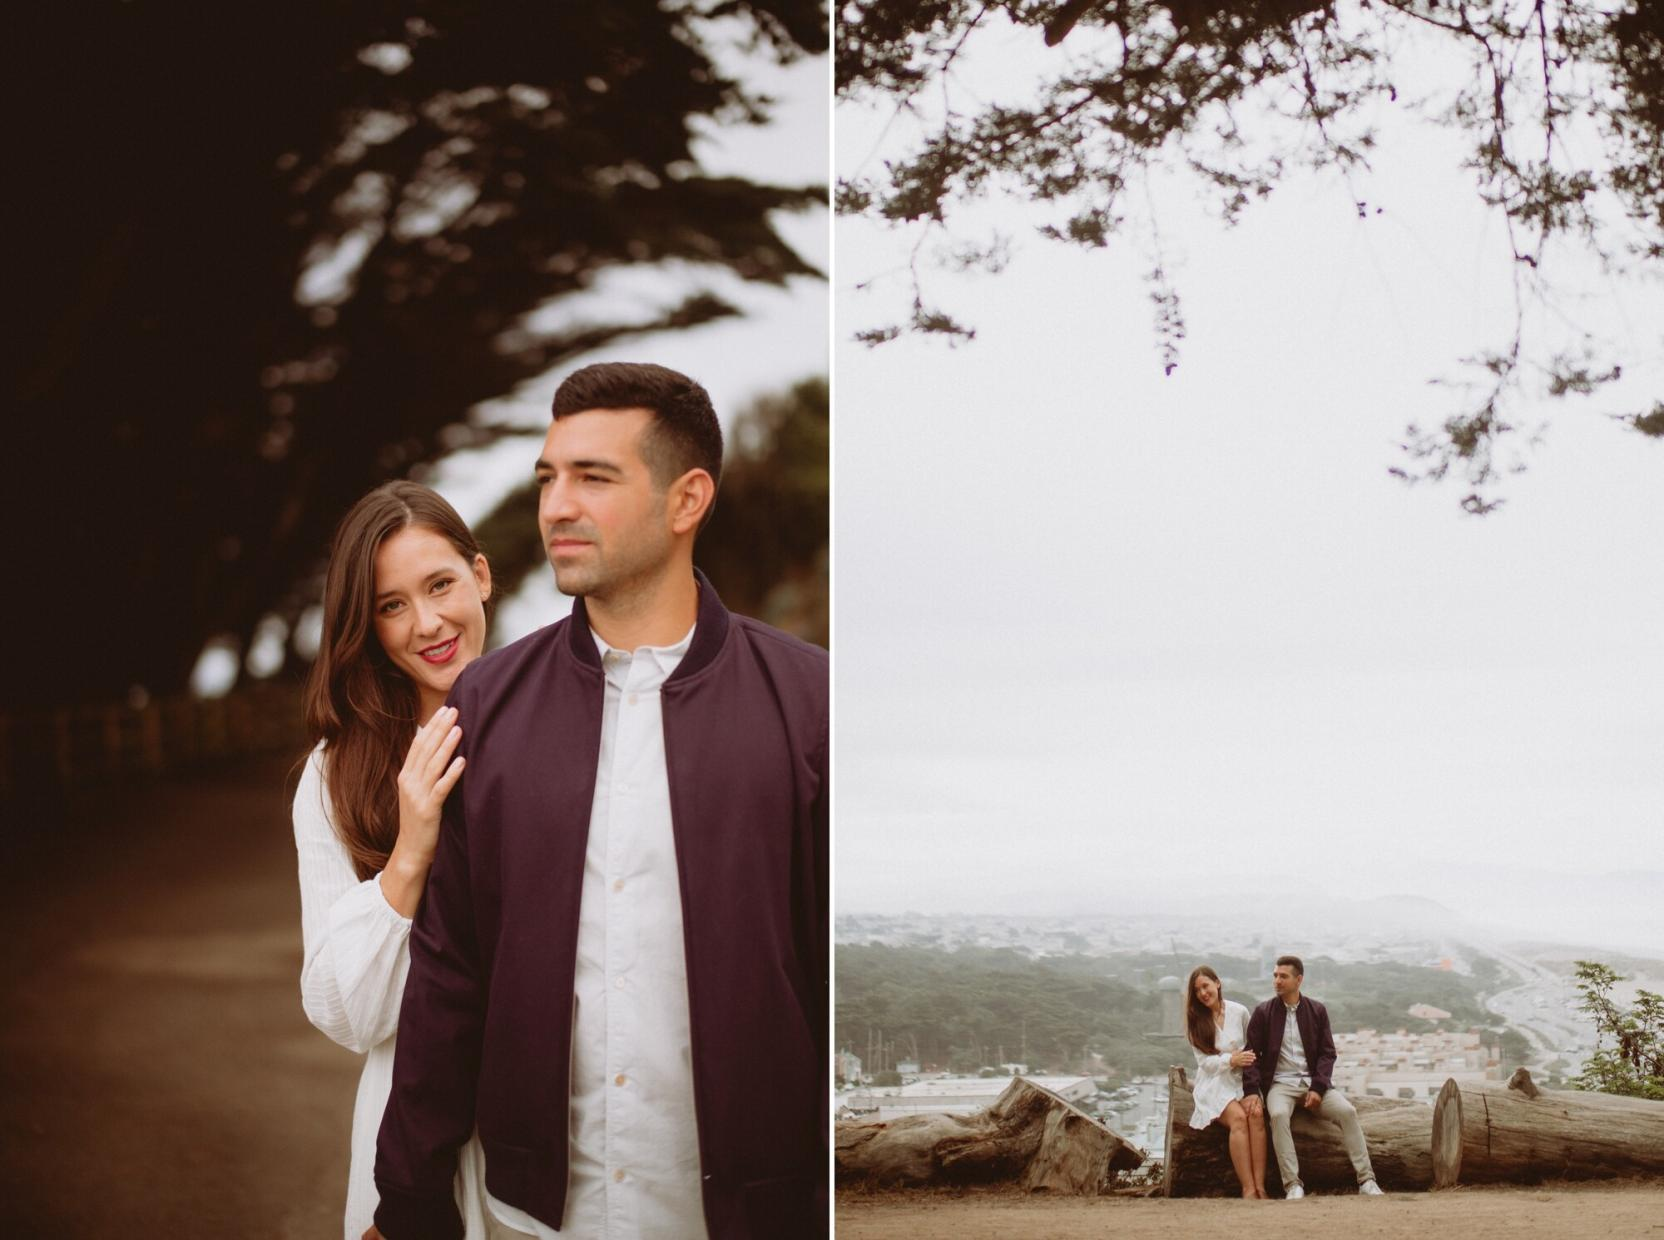 sutro baths engagement photos bay area wedding photographer